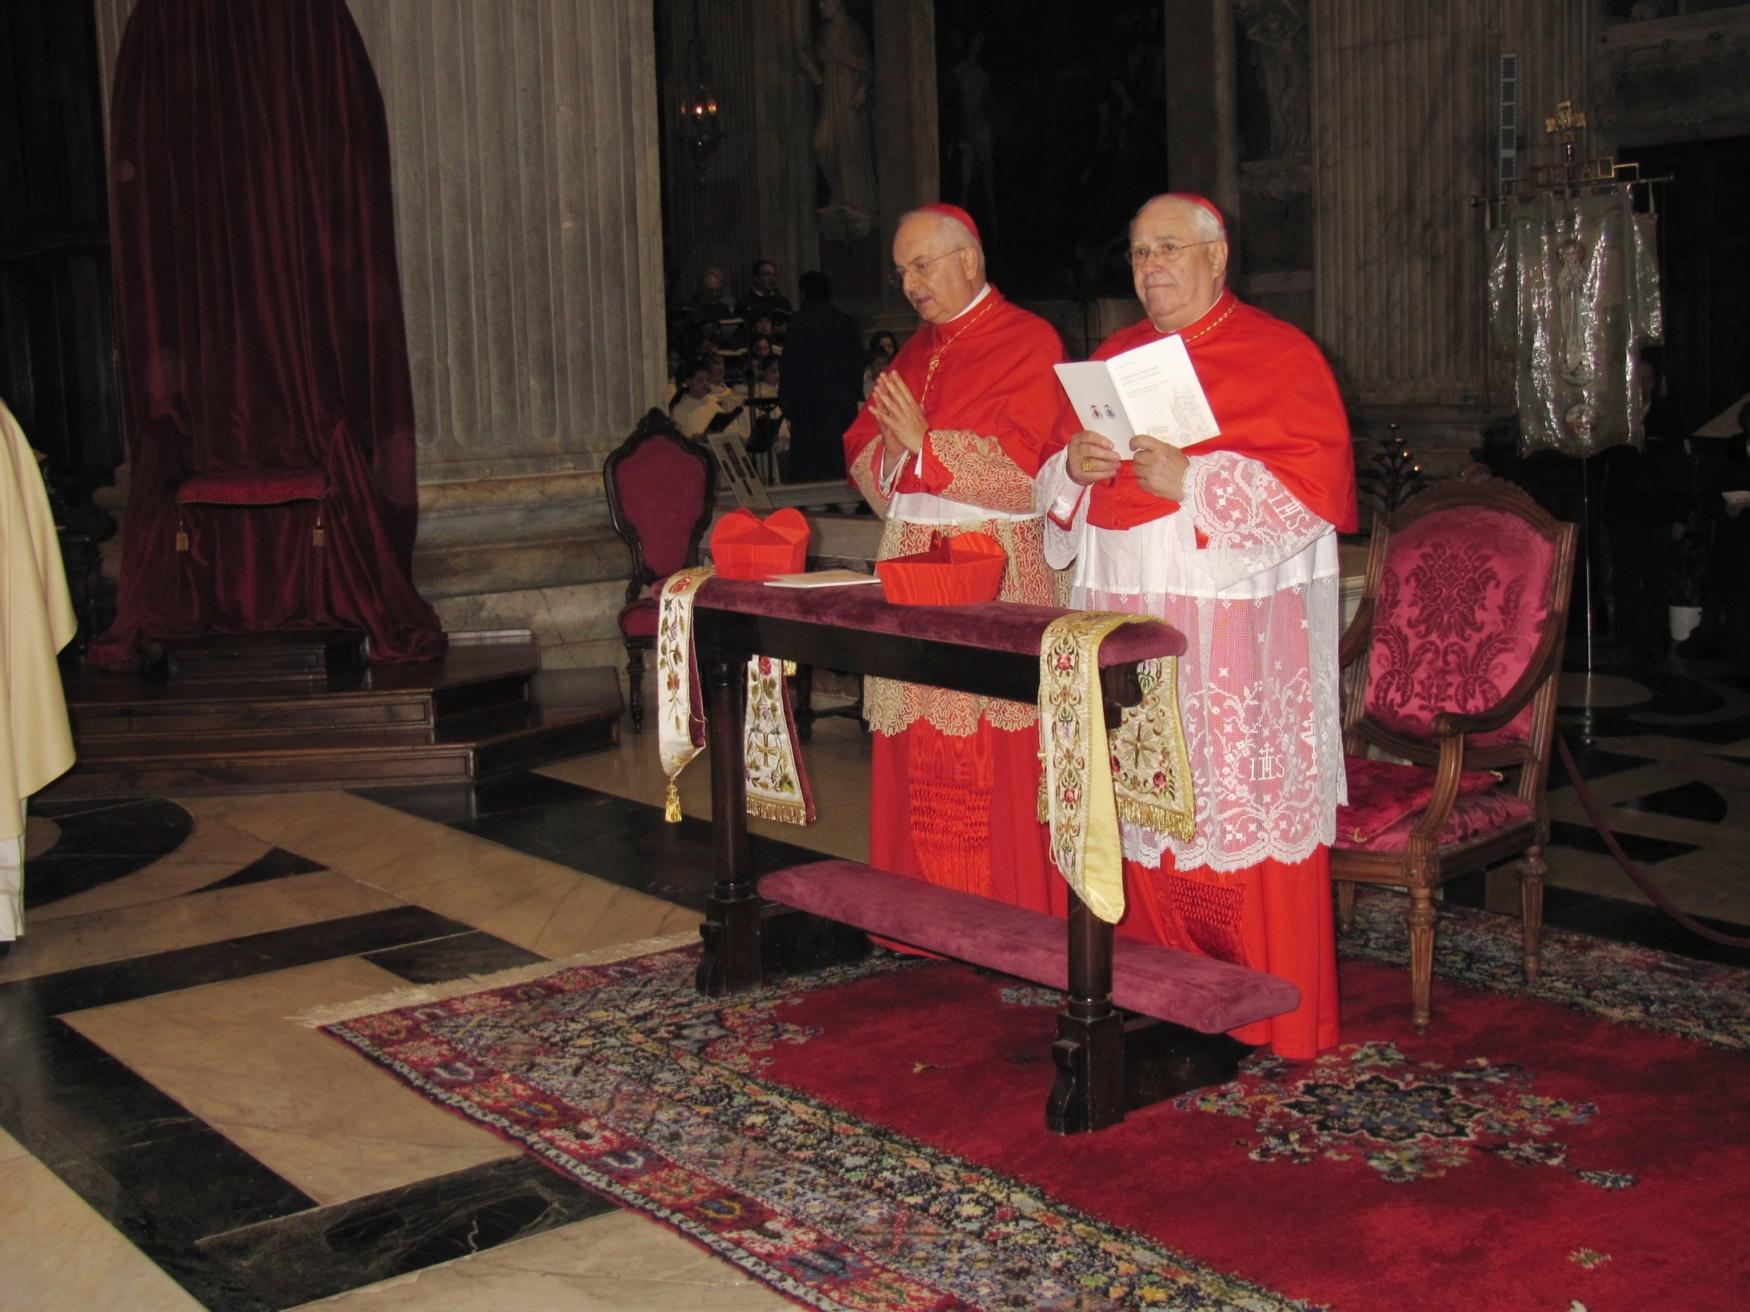 ordinazione_episcopale_gallese_2012-11-11-15-34-35